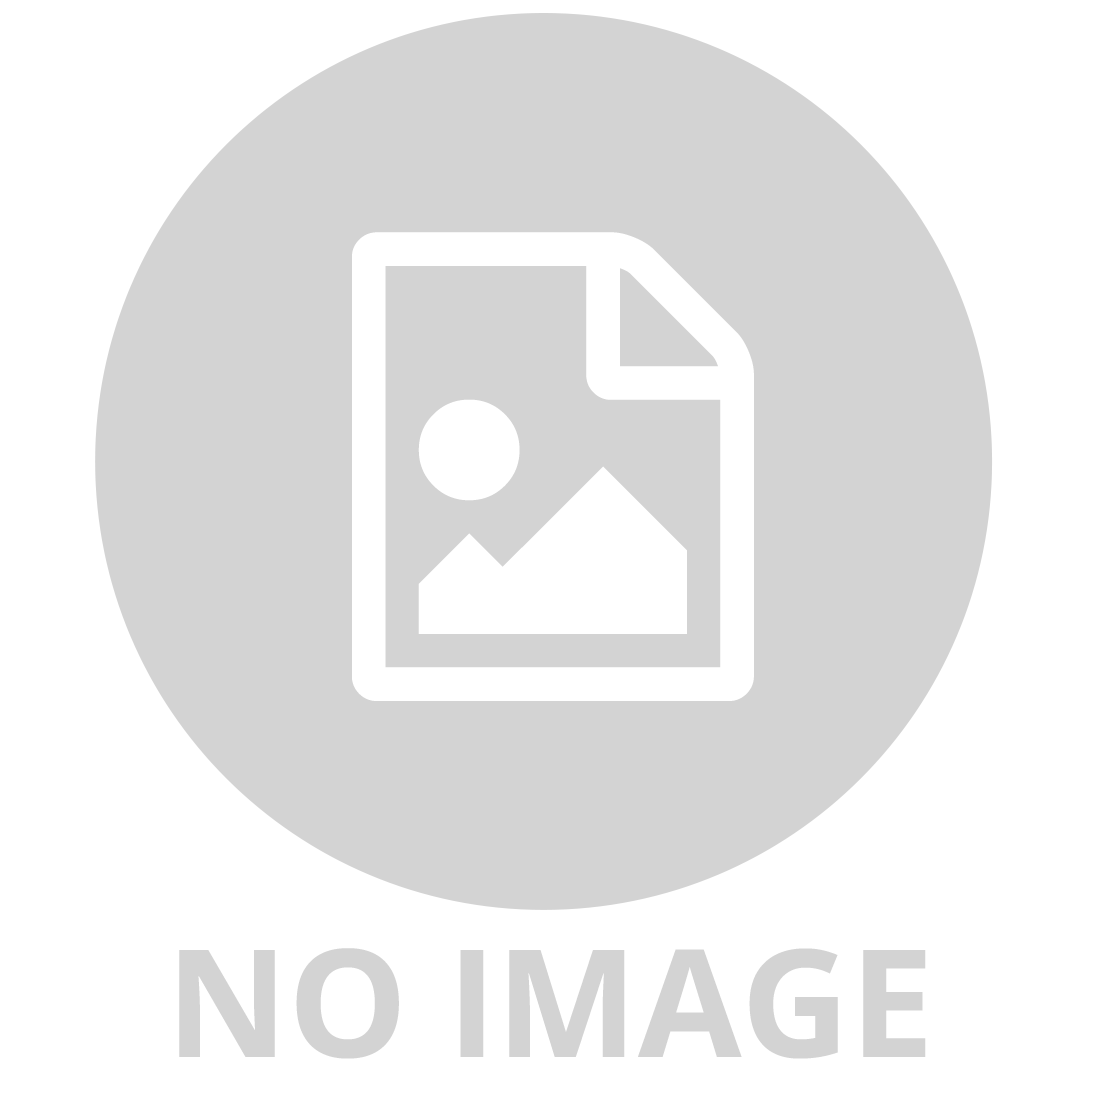 BLUEY'S FAMILY HOME